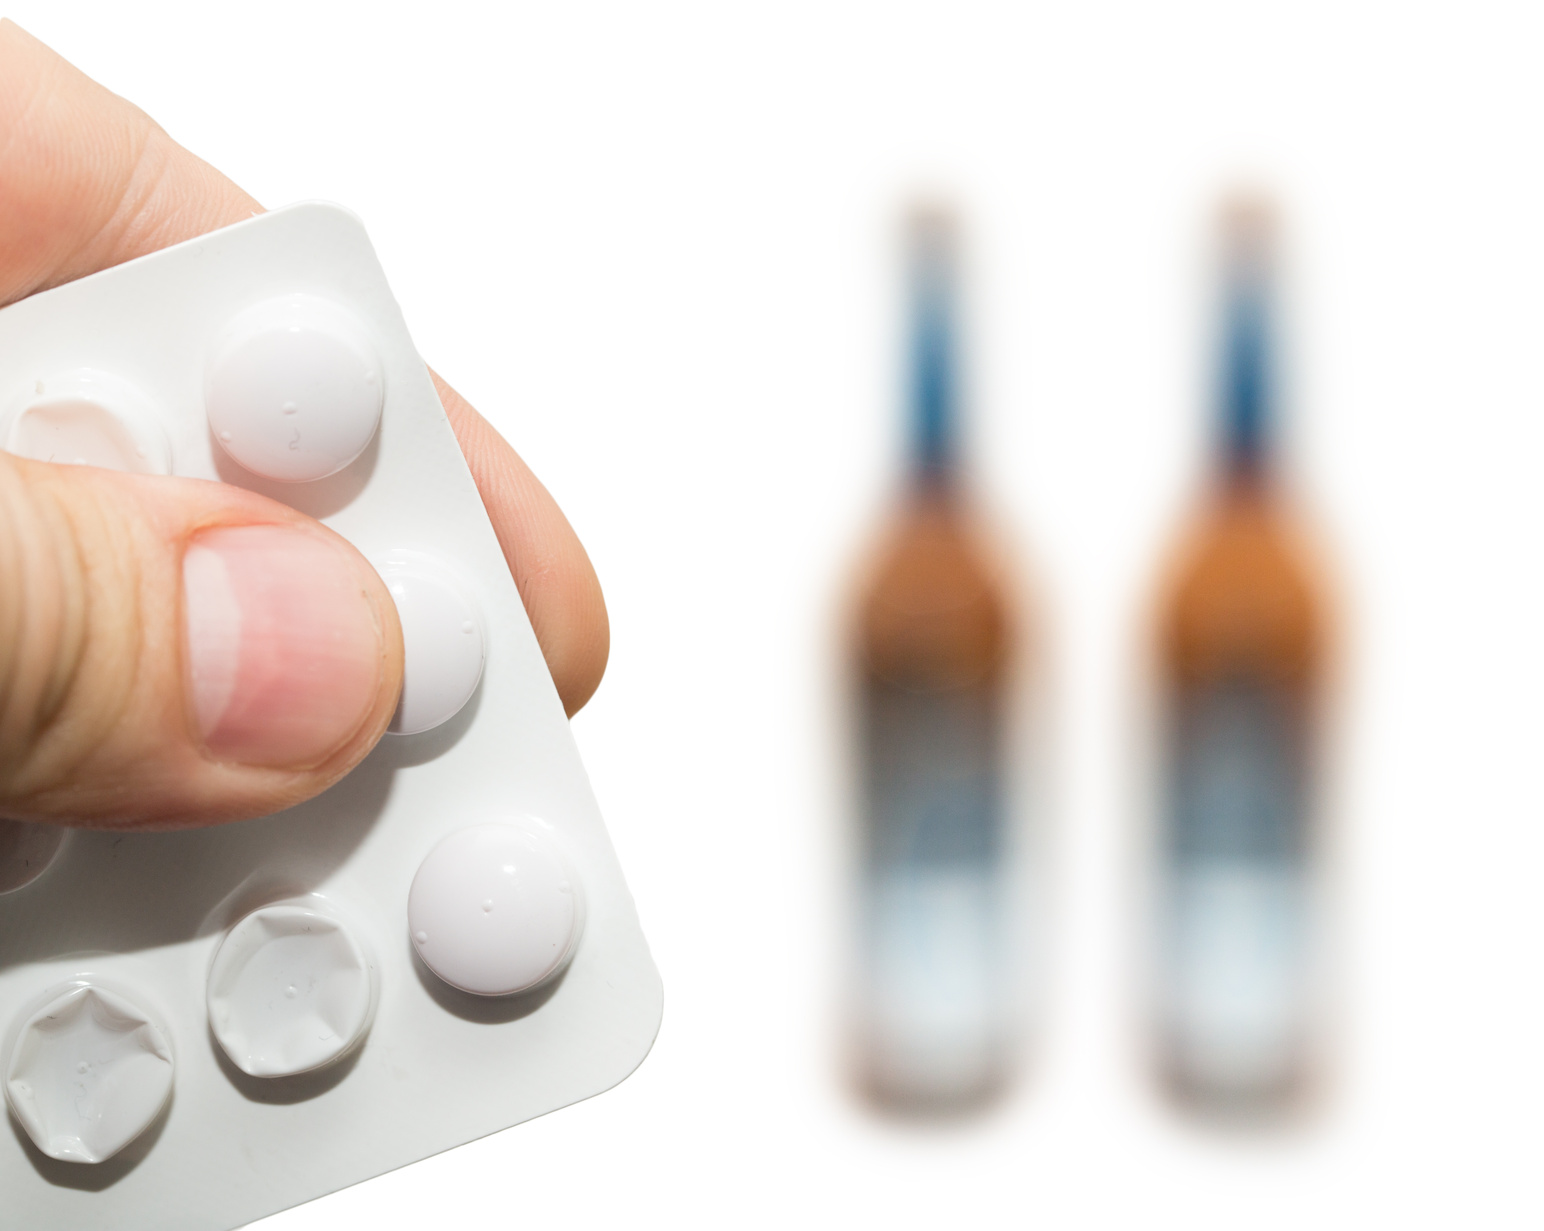 какие таблетки помогают от глистов без назначения